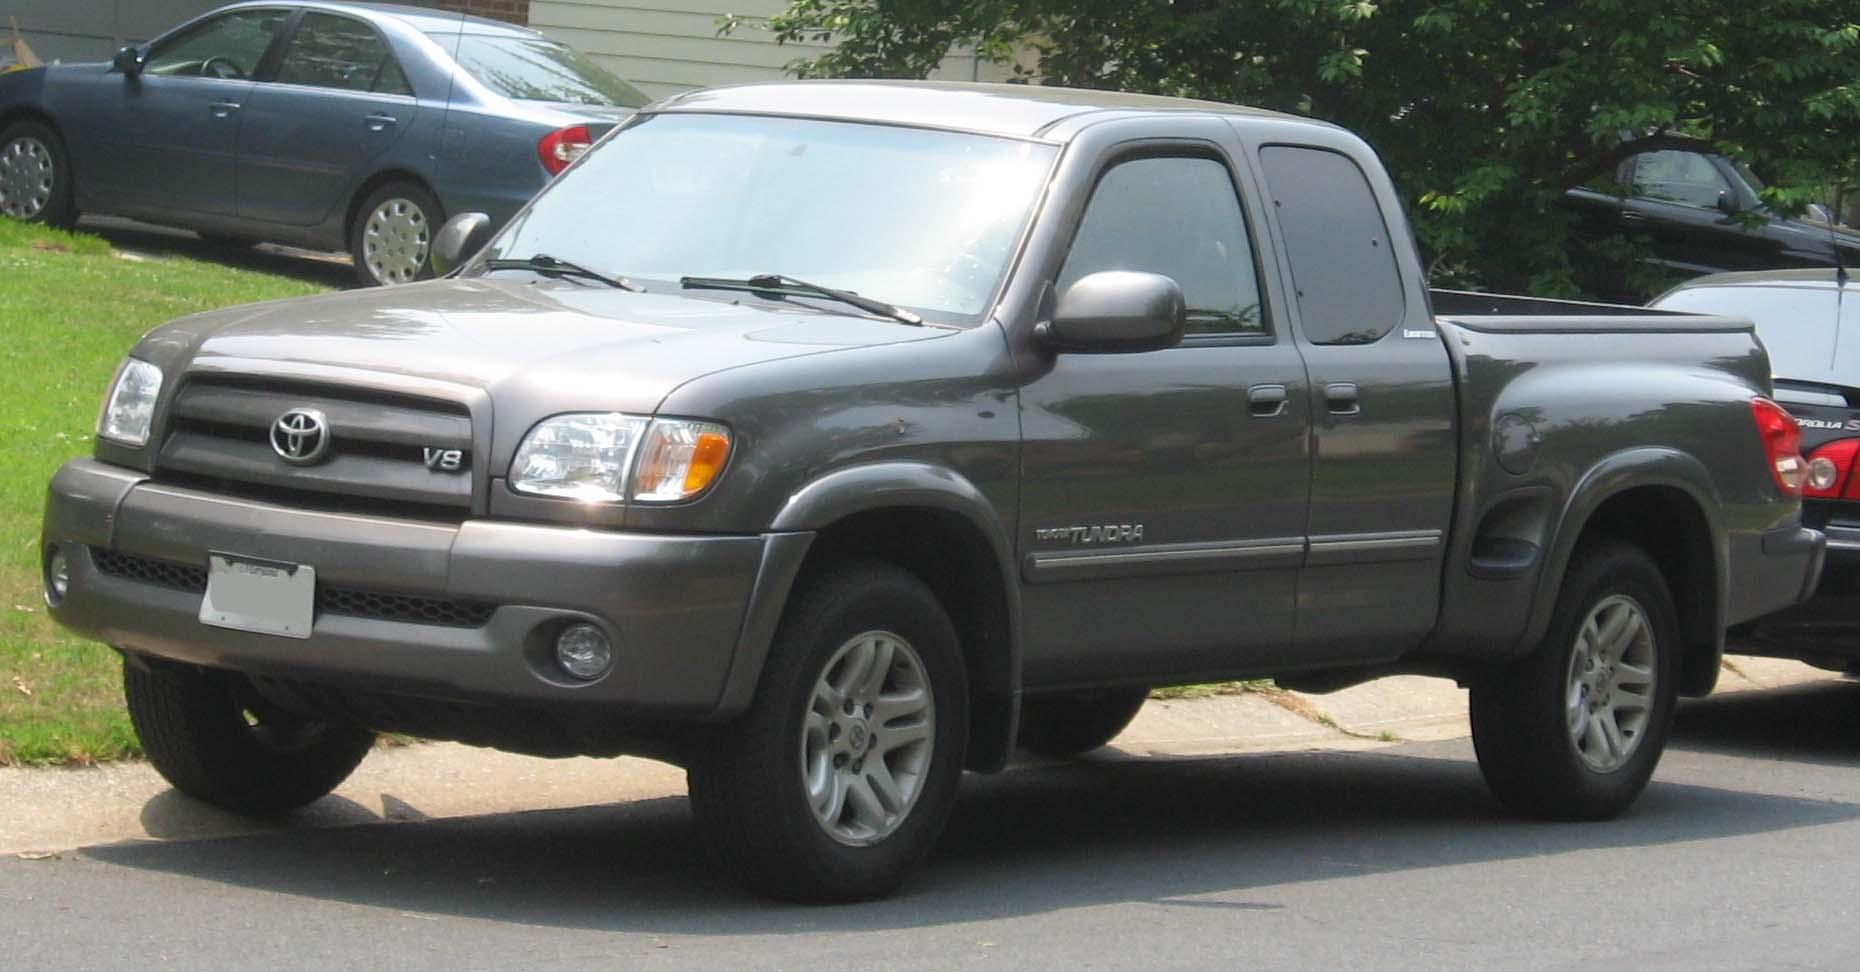 2003 Toyota Tundra Image 16